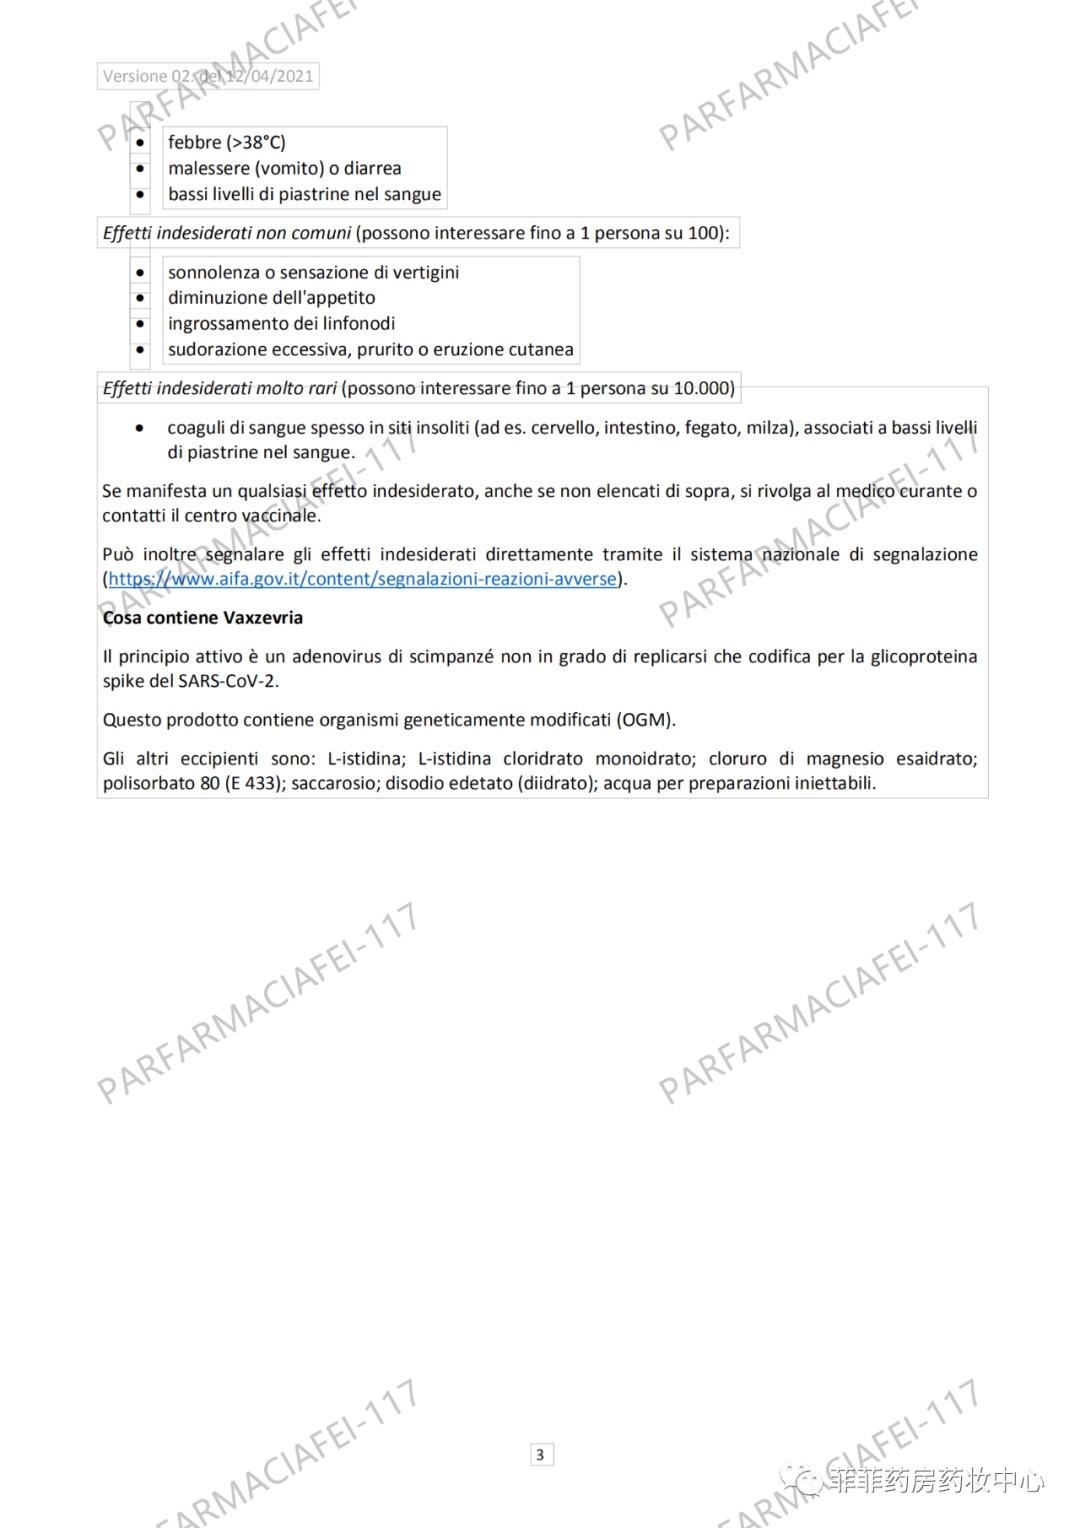 Lazio大区疫苗预约和表格填写攻略 生活百科 第16张